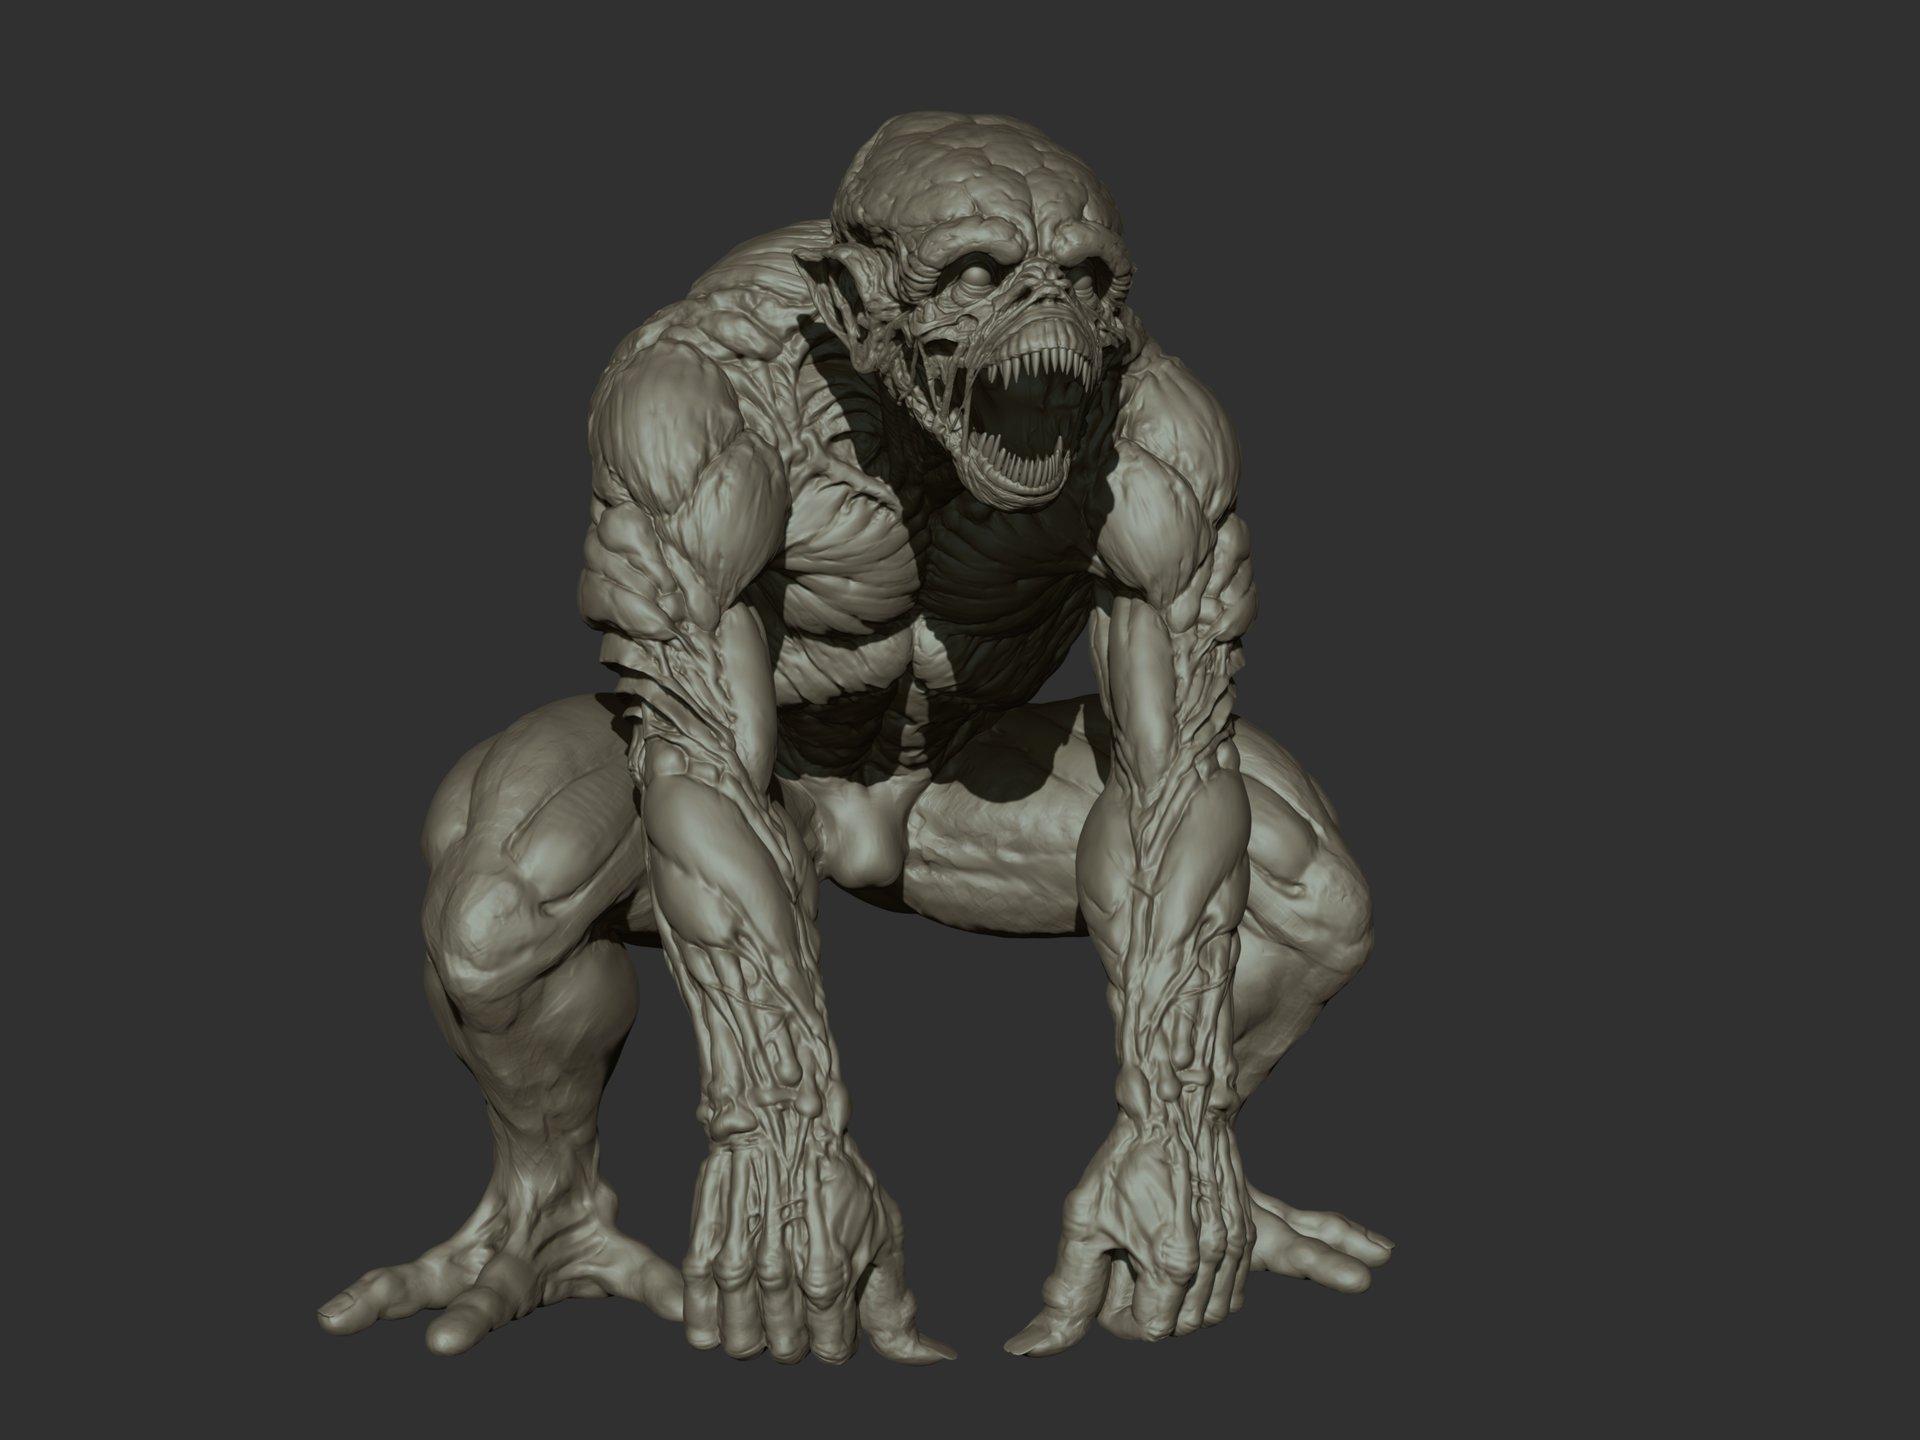 Ganesh poojari monster 001